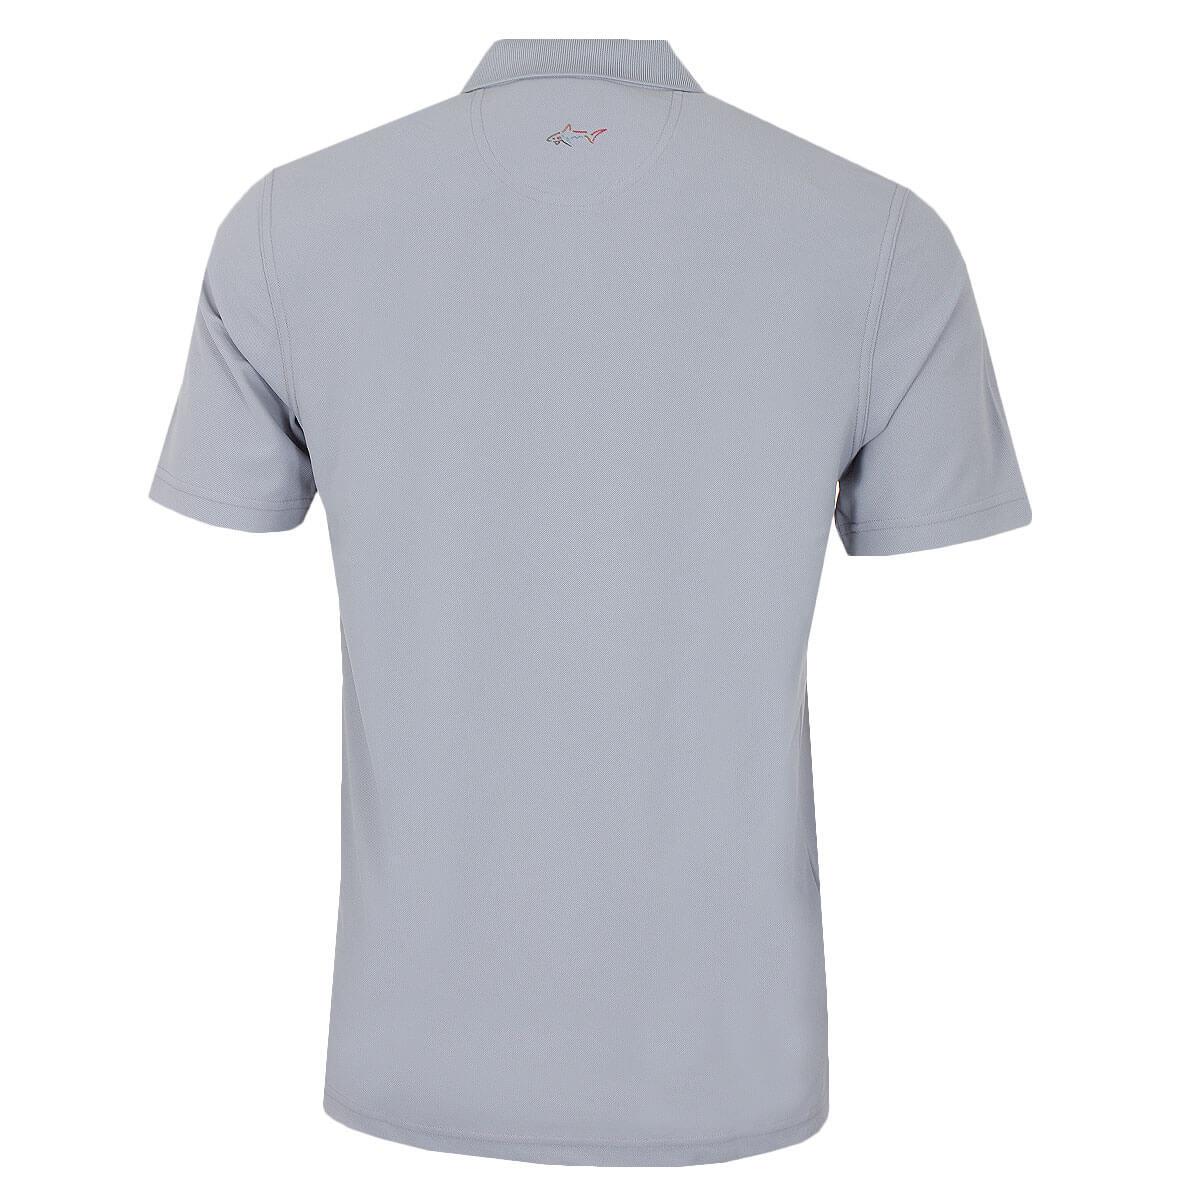 Greg-Norman-Mens-KX04-Performance-Micro-Pique-Golf-Polo-Shirt-28-OFF-RRP thumbnail 71